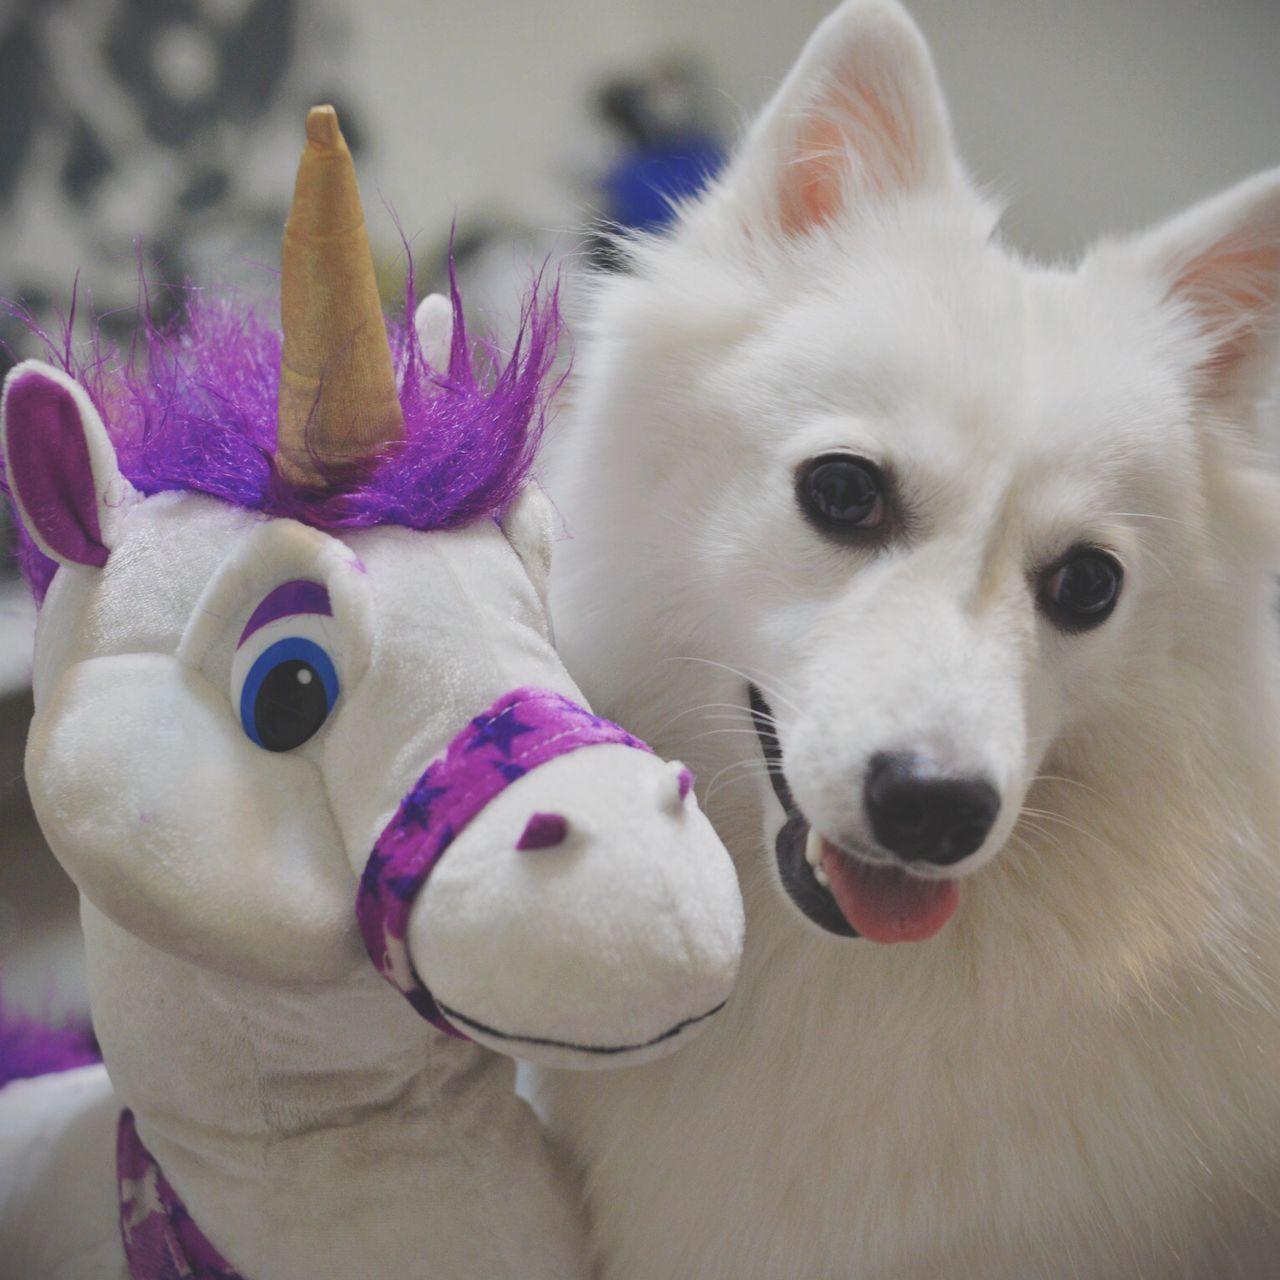 Imaginary friend Pet Photography  Cute Pets Japanese Spitz Petstagram